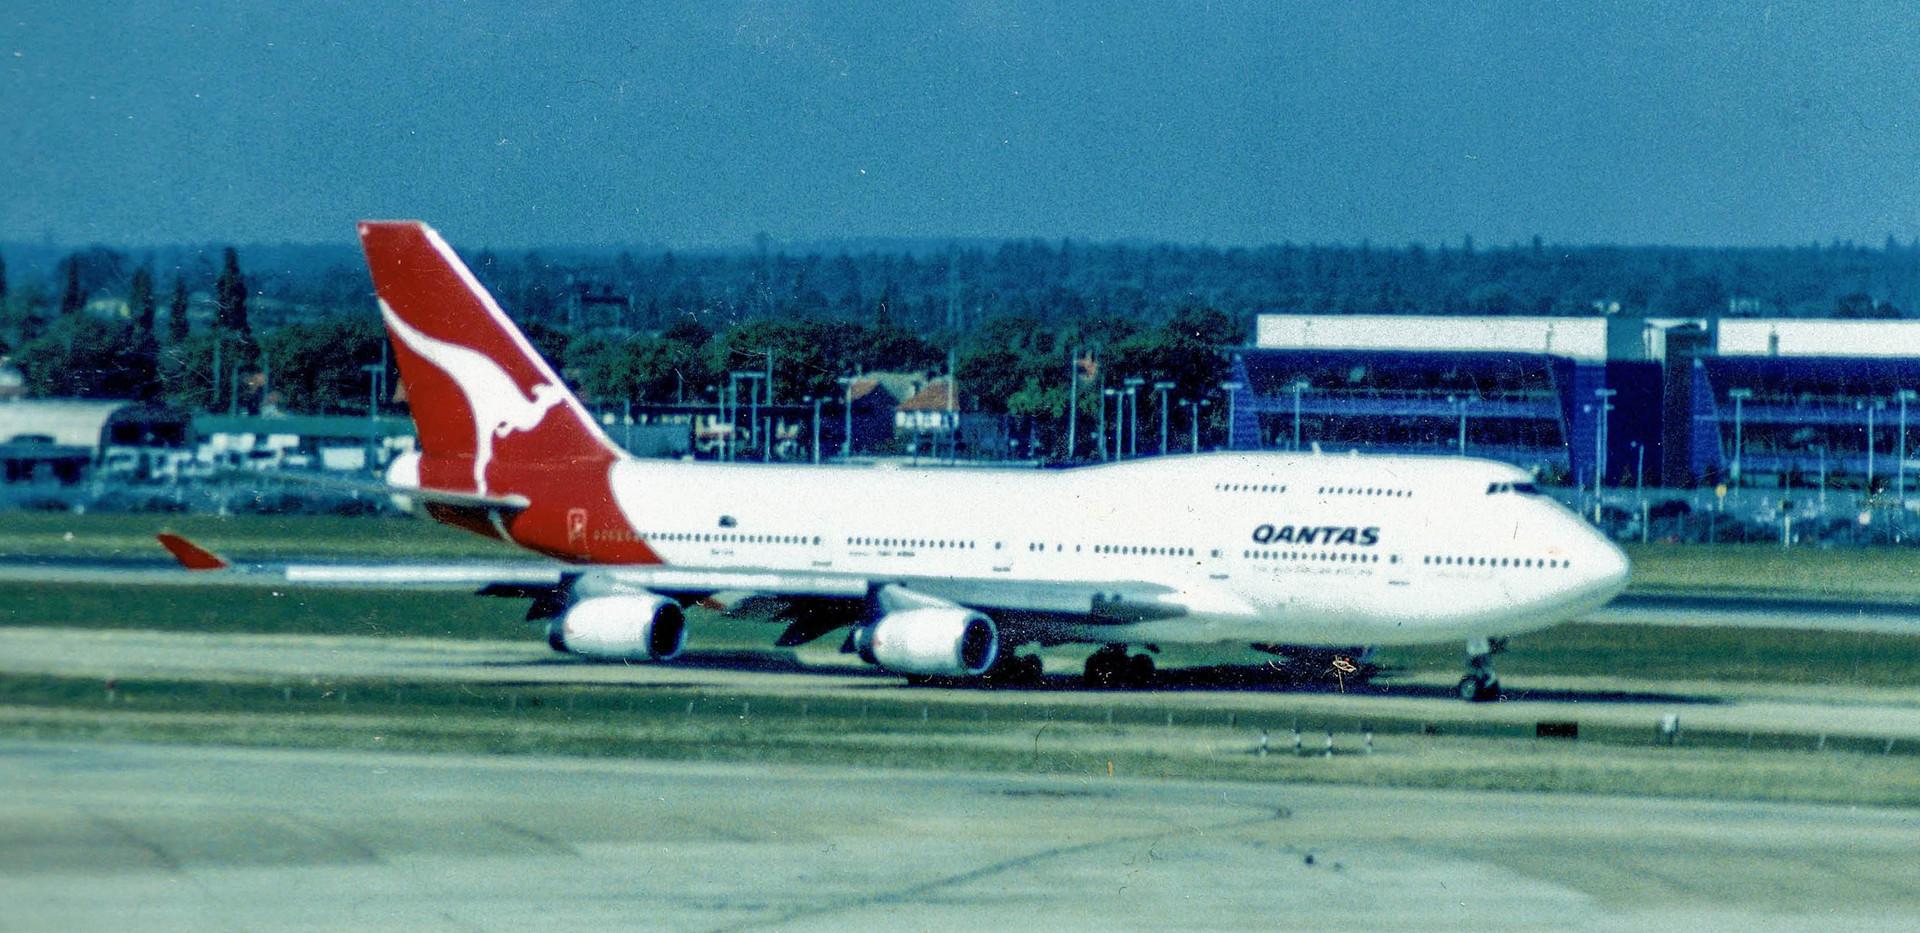 egll--qantas-747-400_39174437691_o.jpg